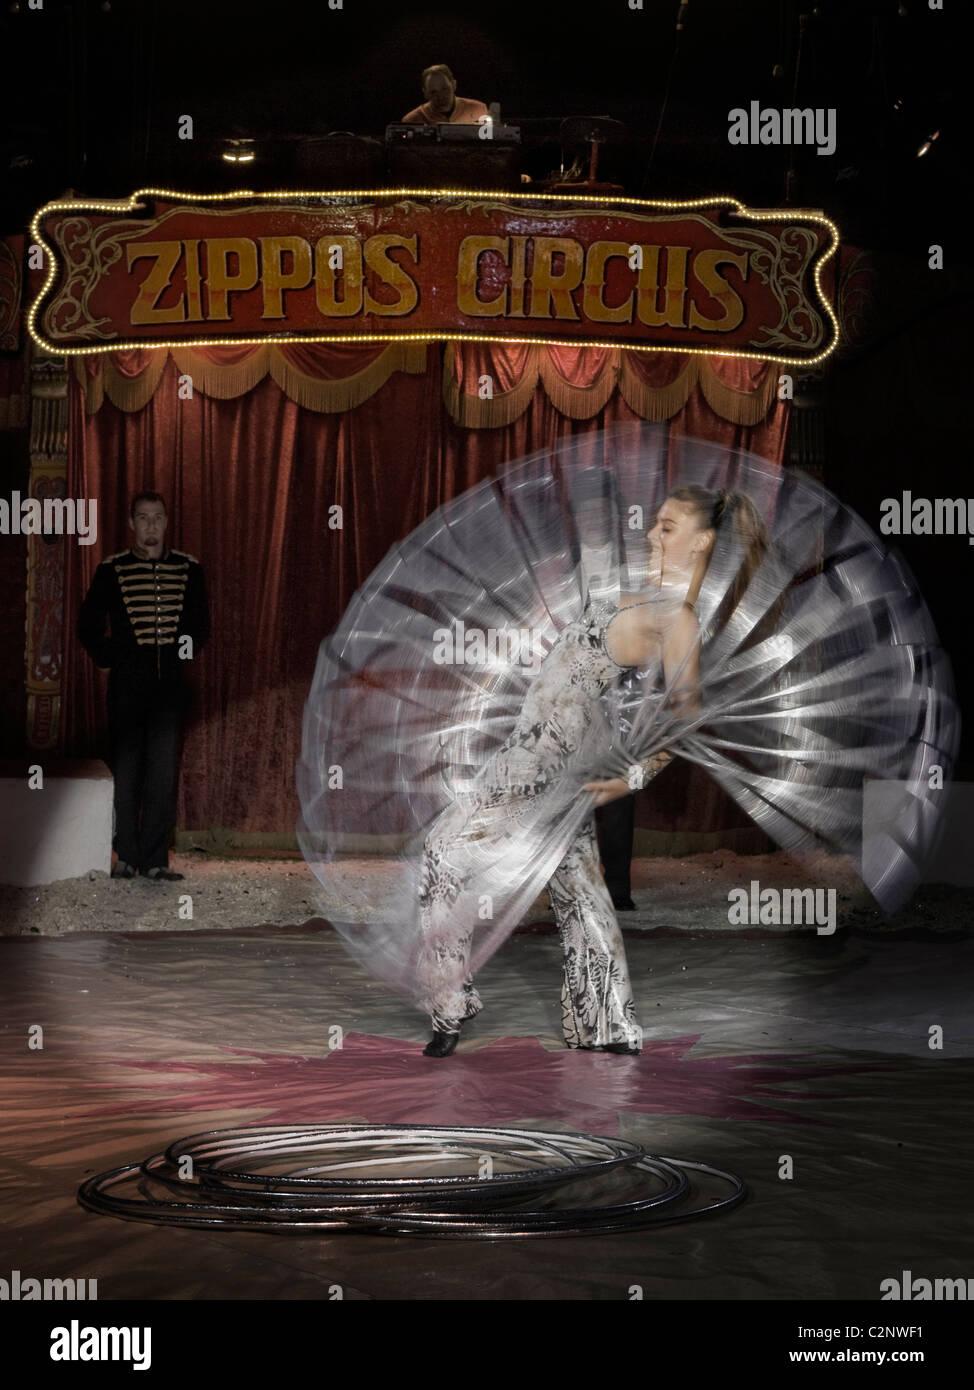 Zippo's Hoop Girl Stock Photo